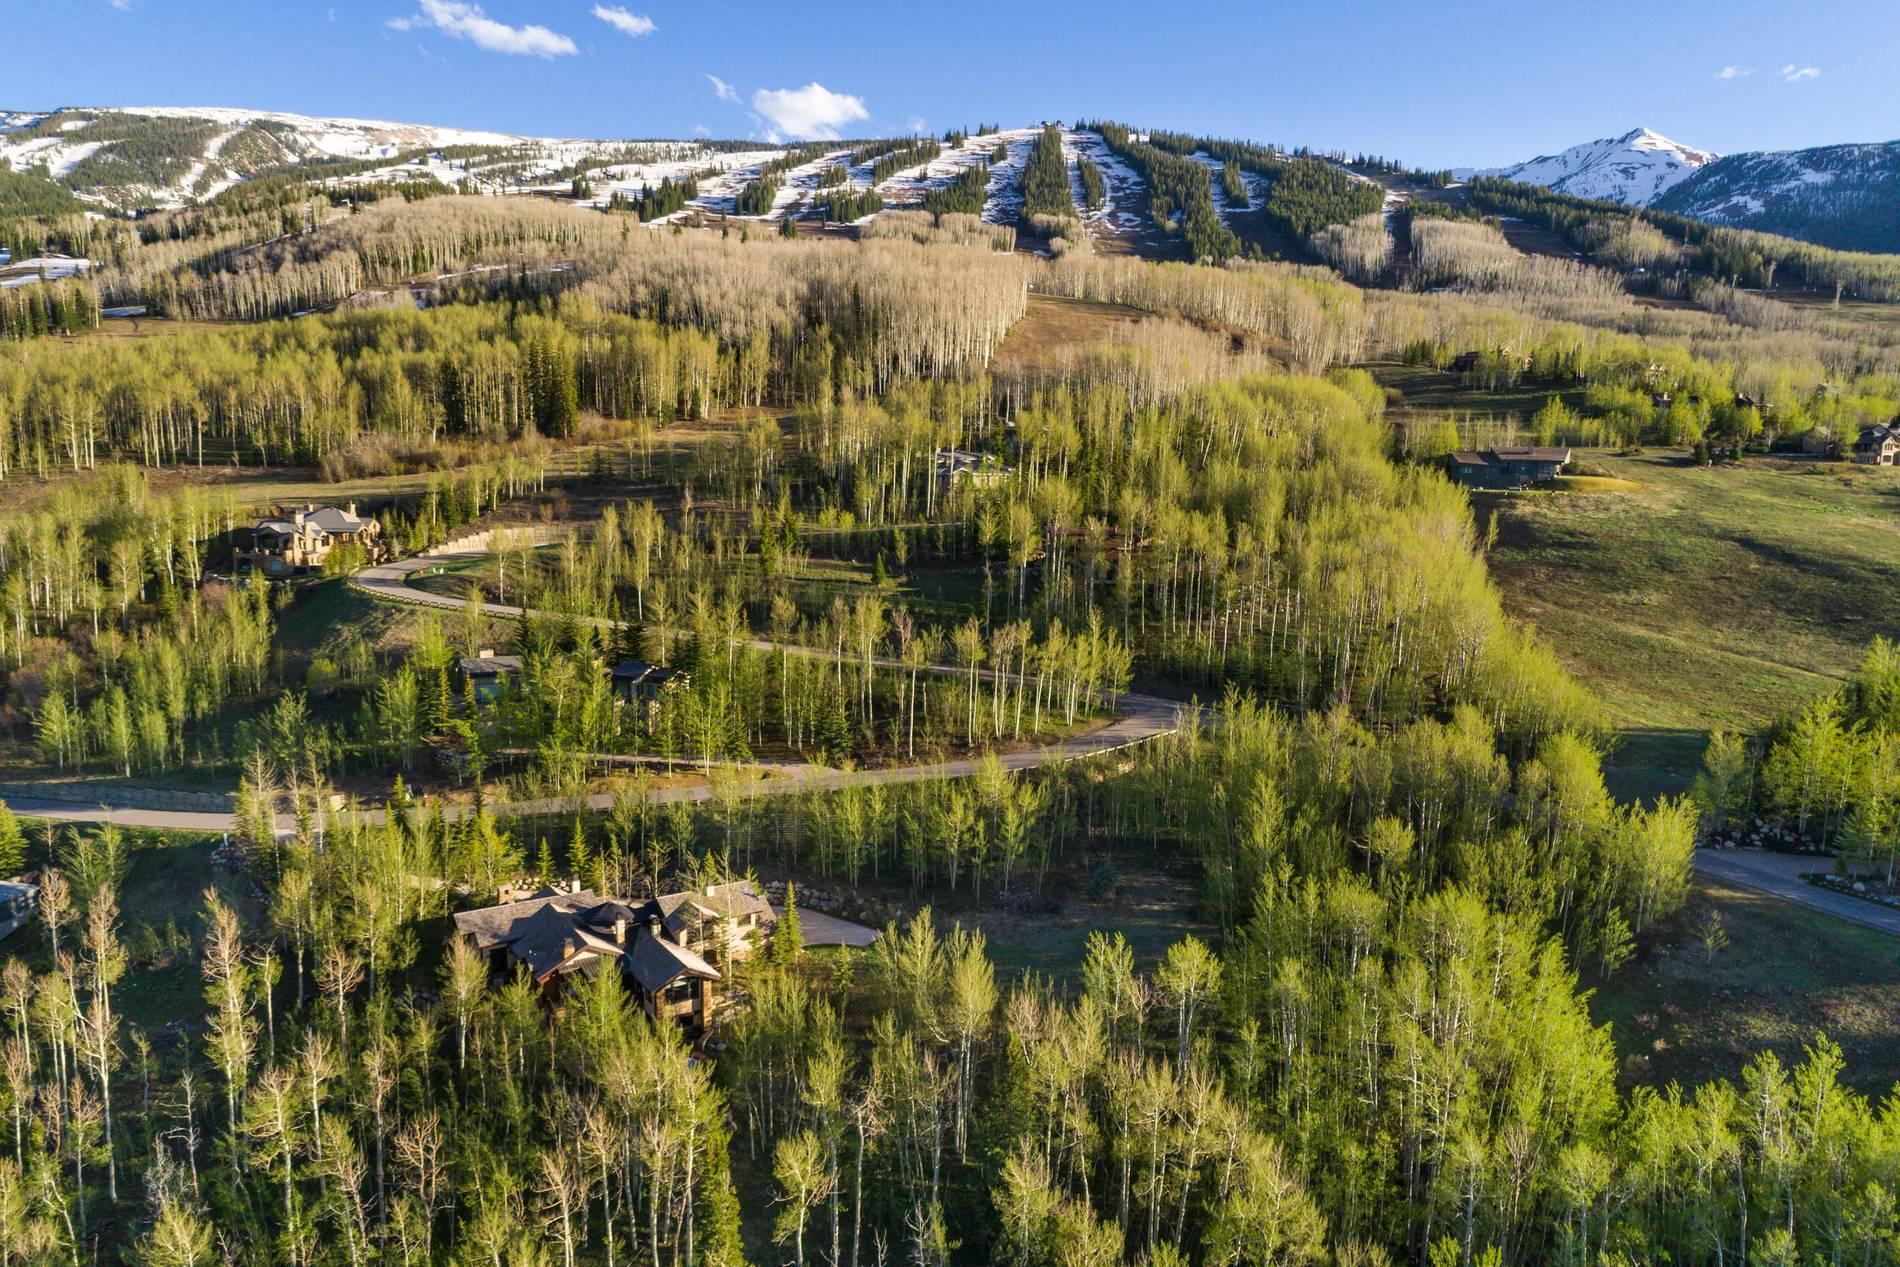 56 Aspen Way Snowmass Village Photo 36